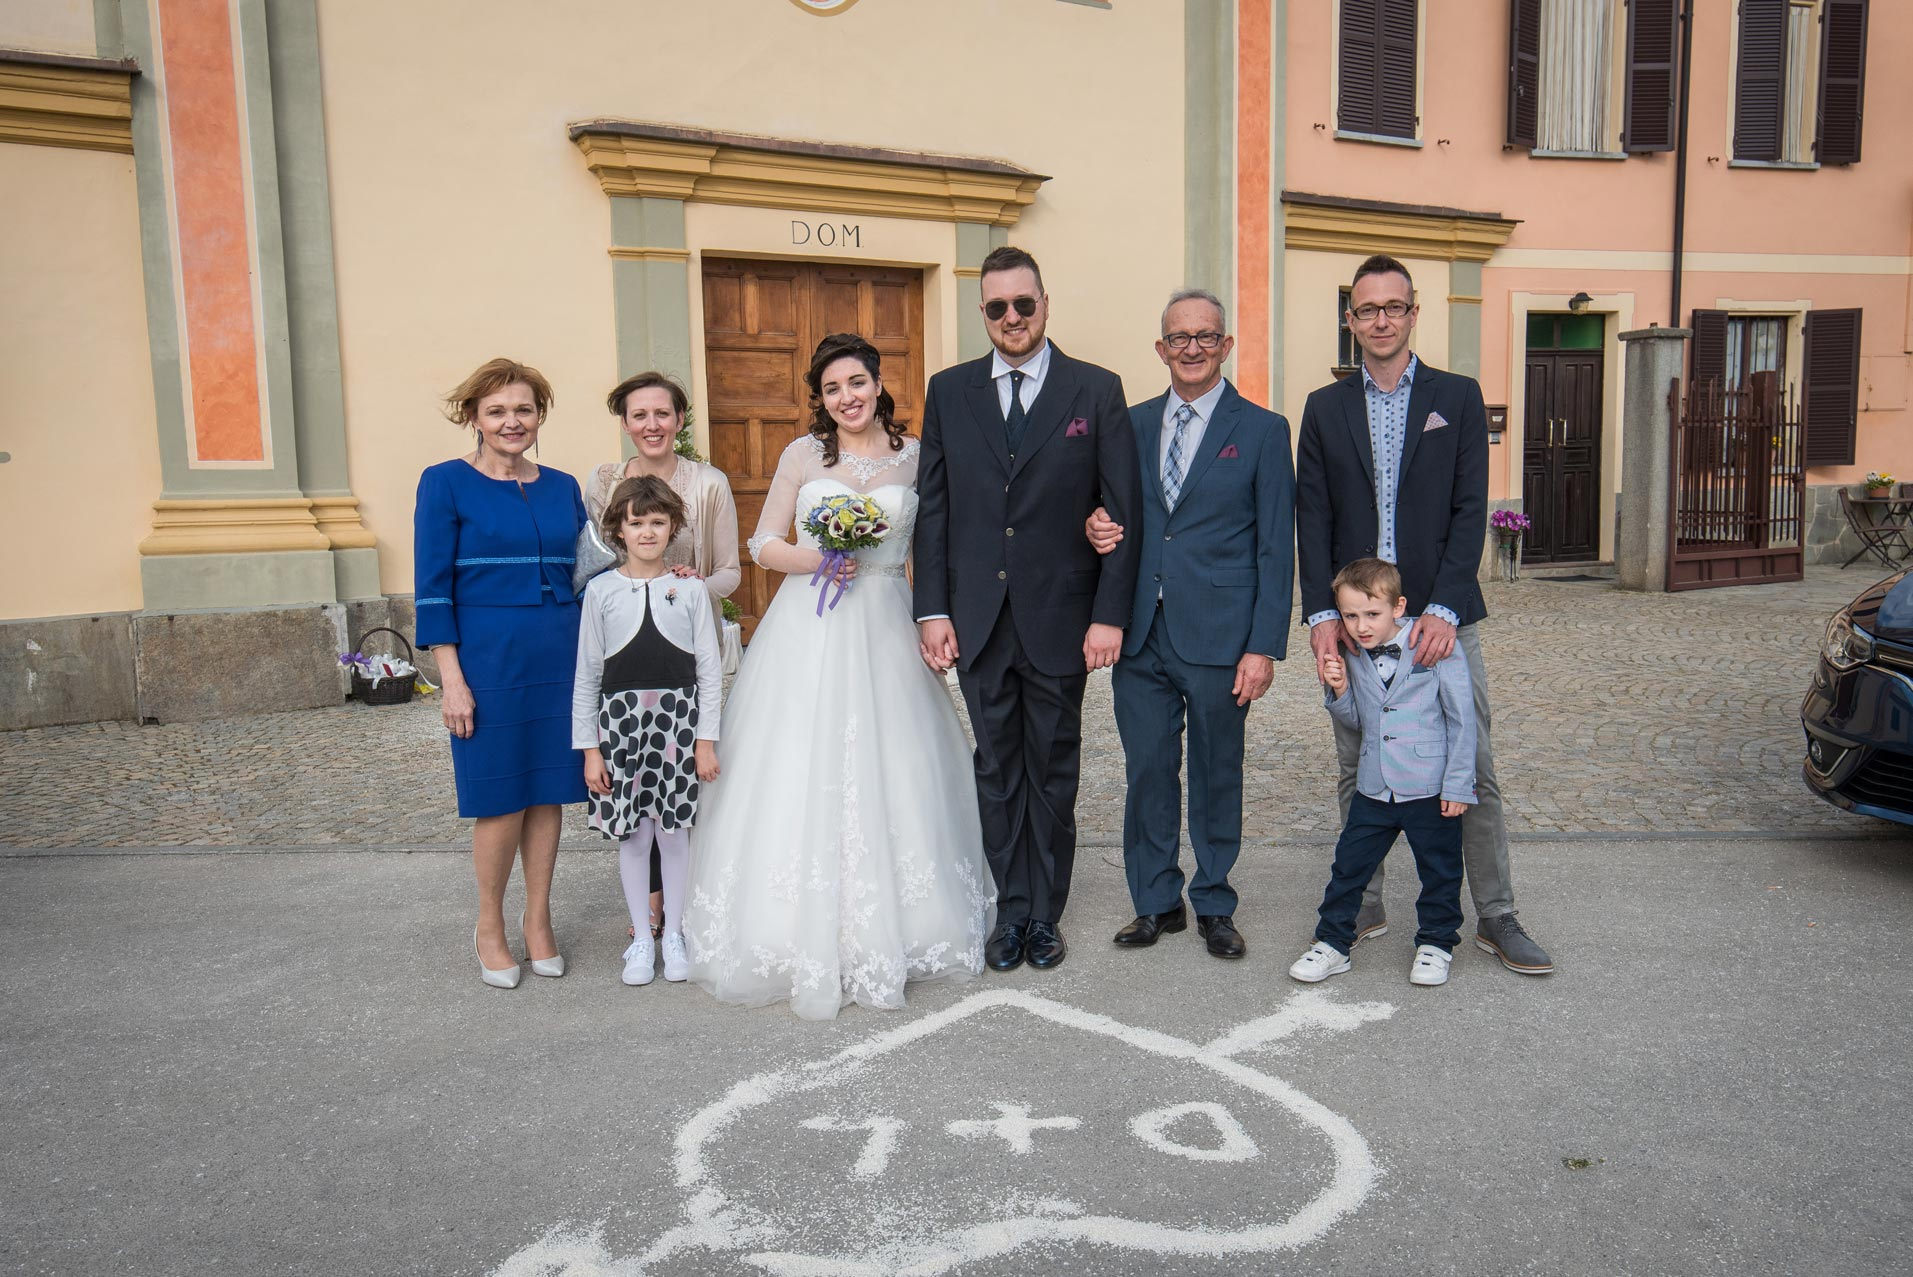 Matrimonio a Narzole Lorenza Diego - DSC 0639 - Fotografie matrimonio con parenti - Fotografie matrimonio con parenti